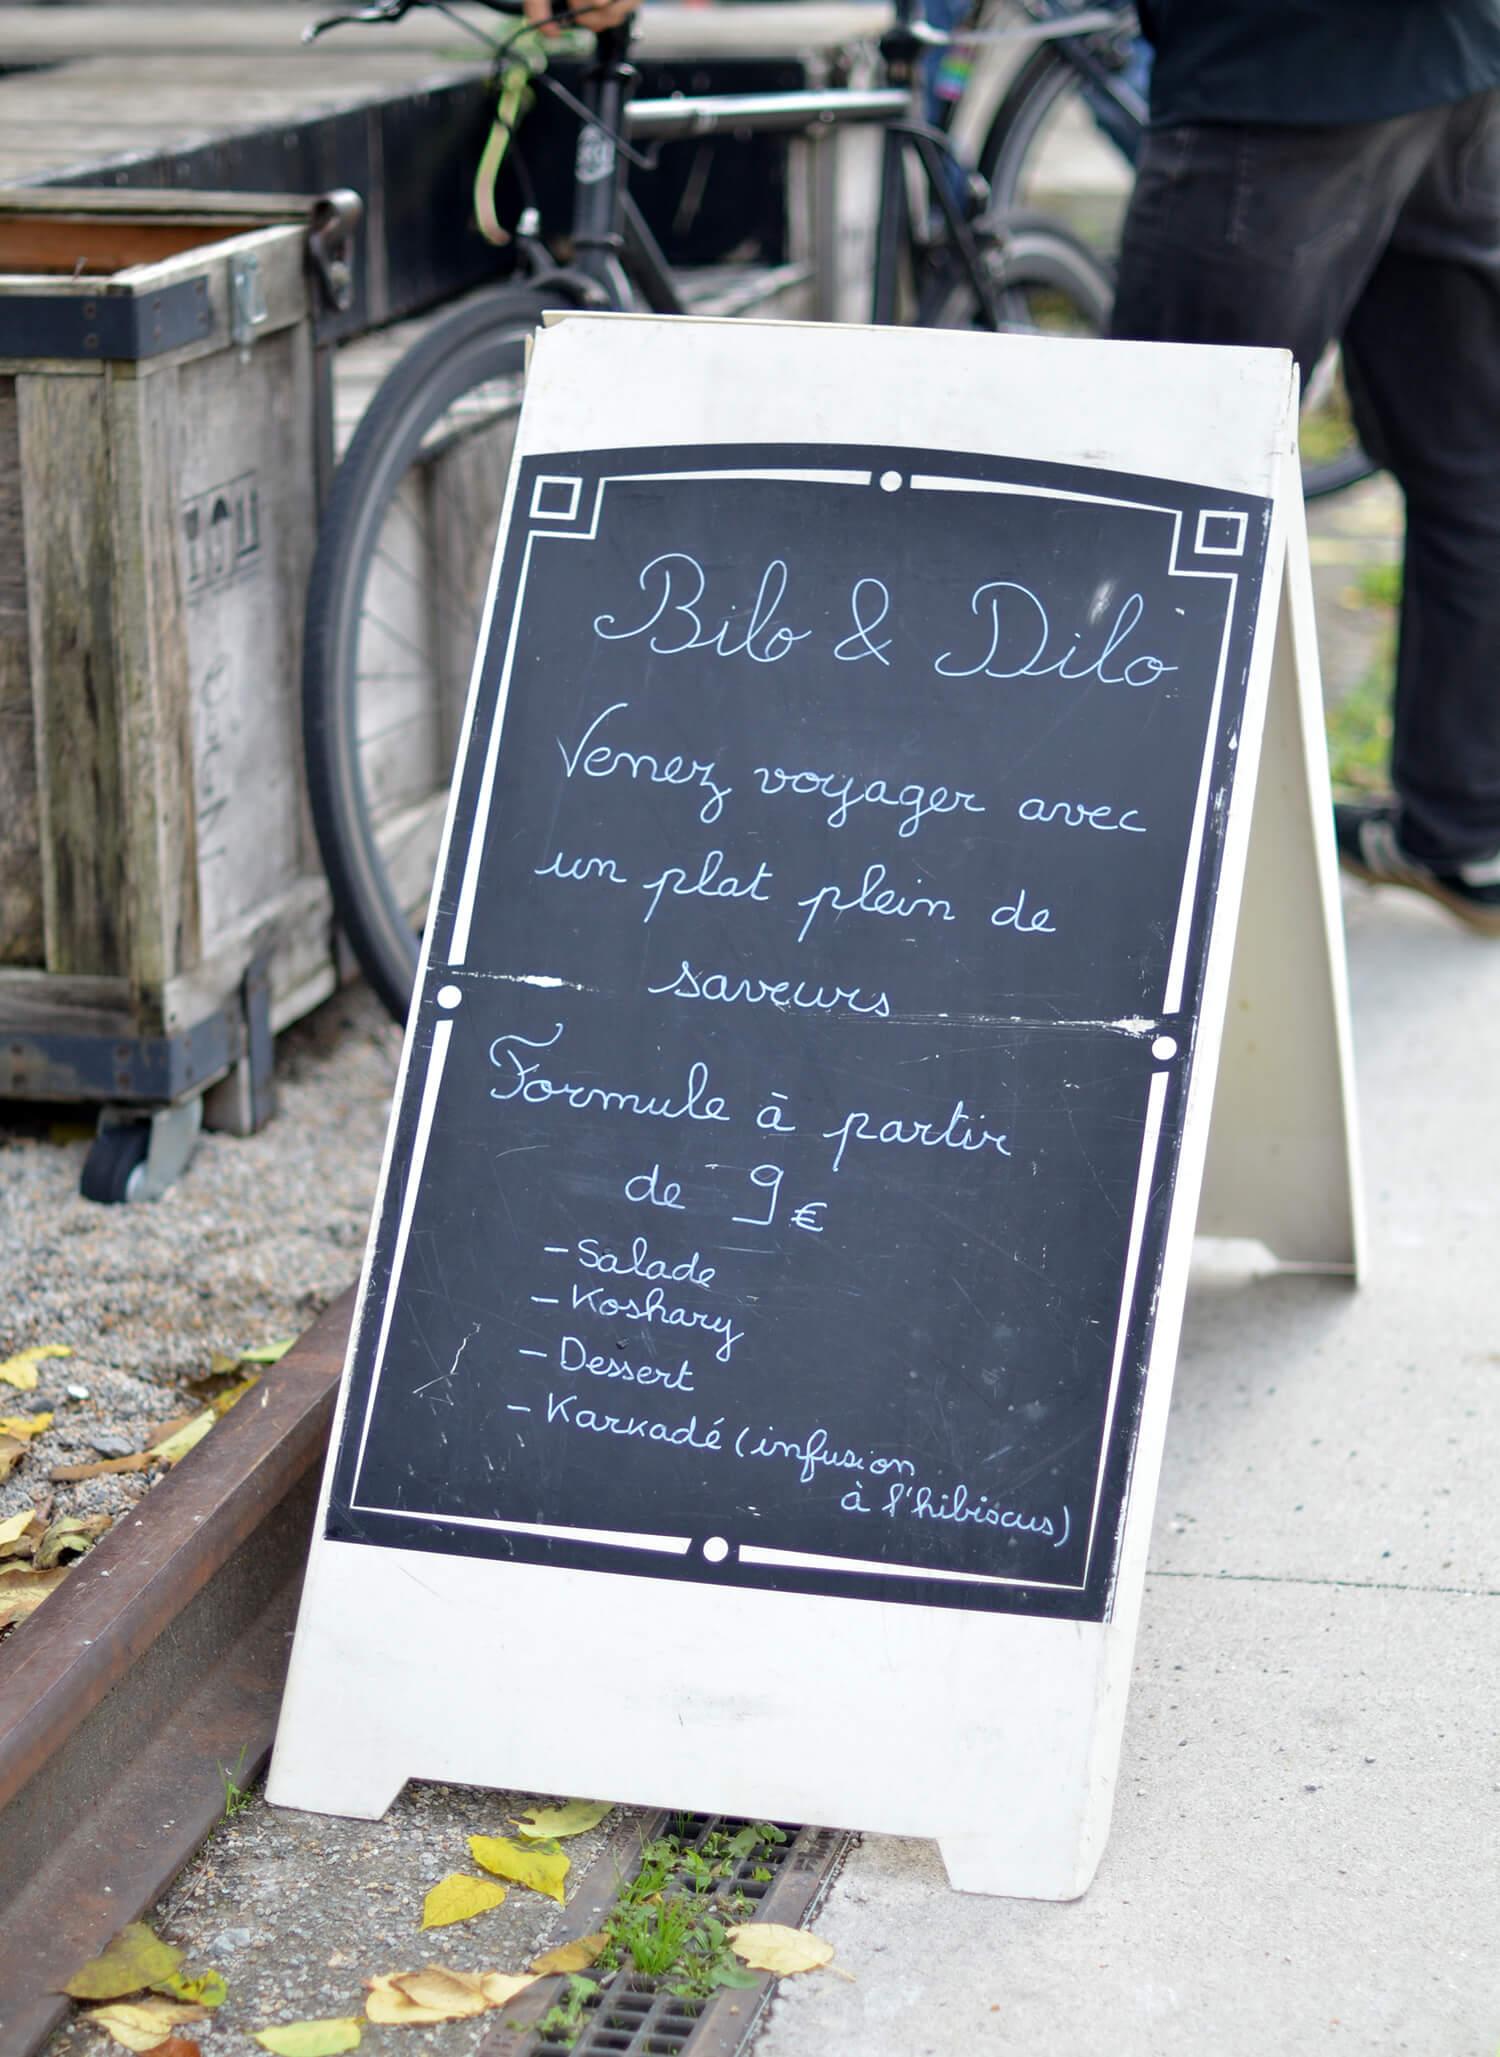 Bilo&Dilo Food truck égyptien menu vegan-friendly